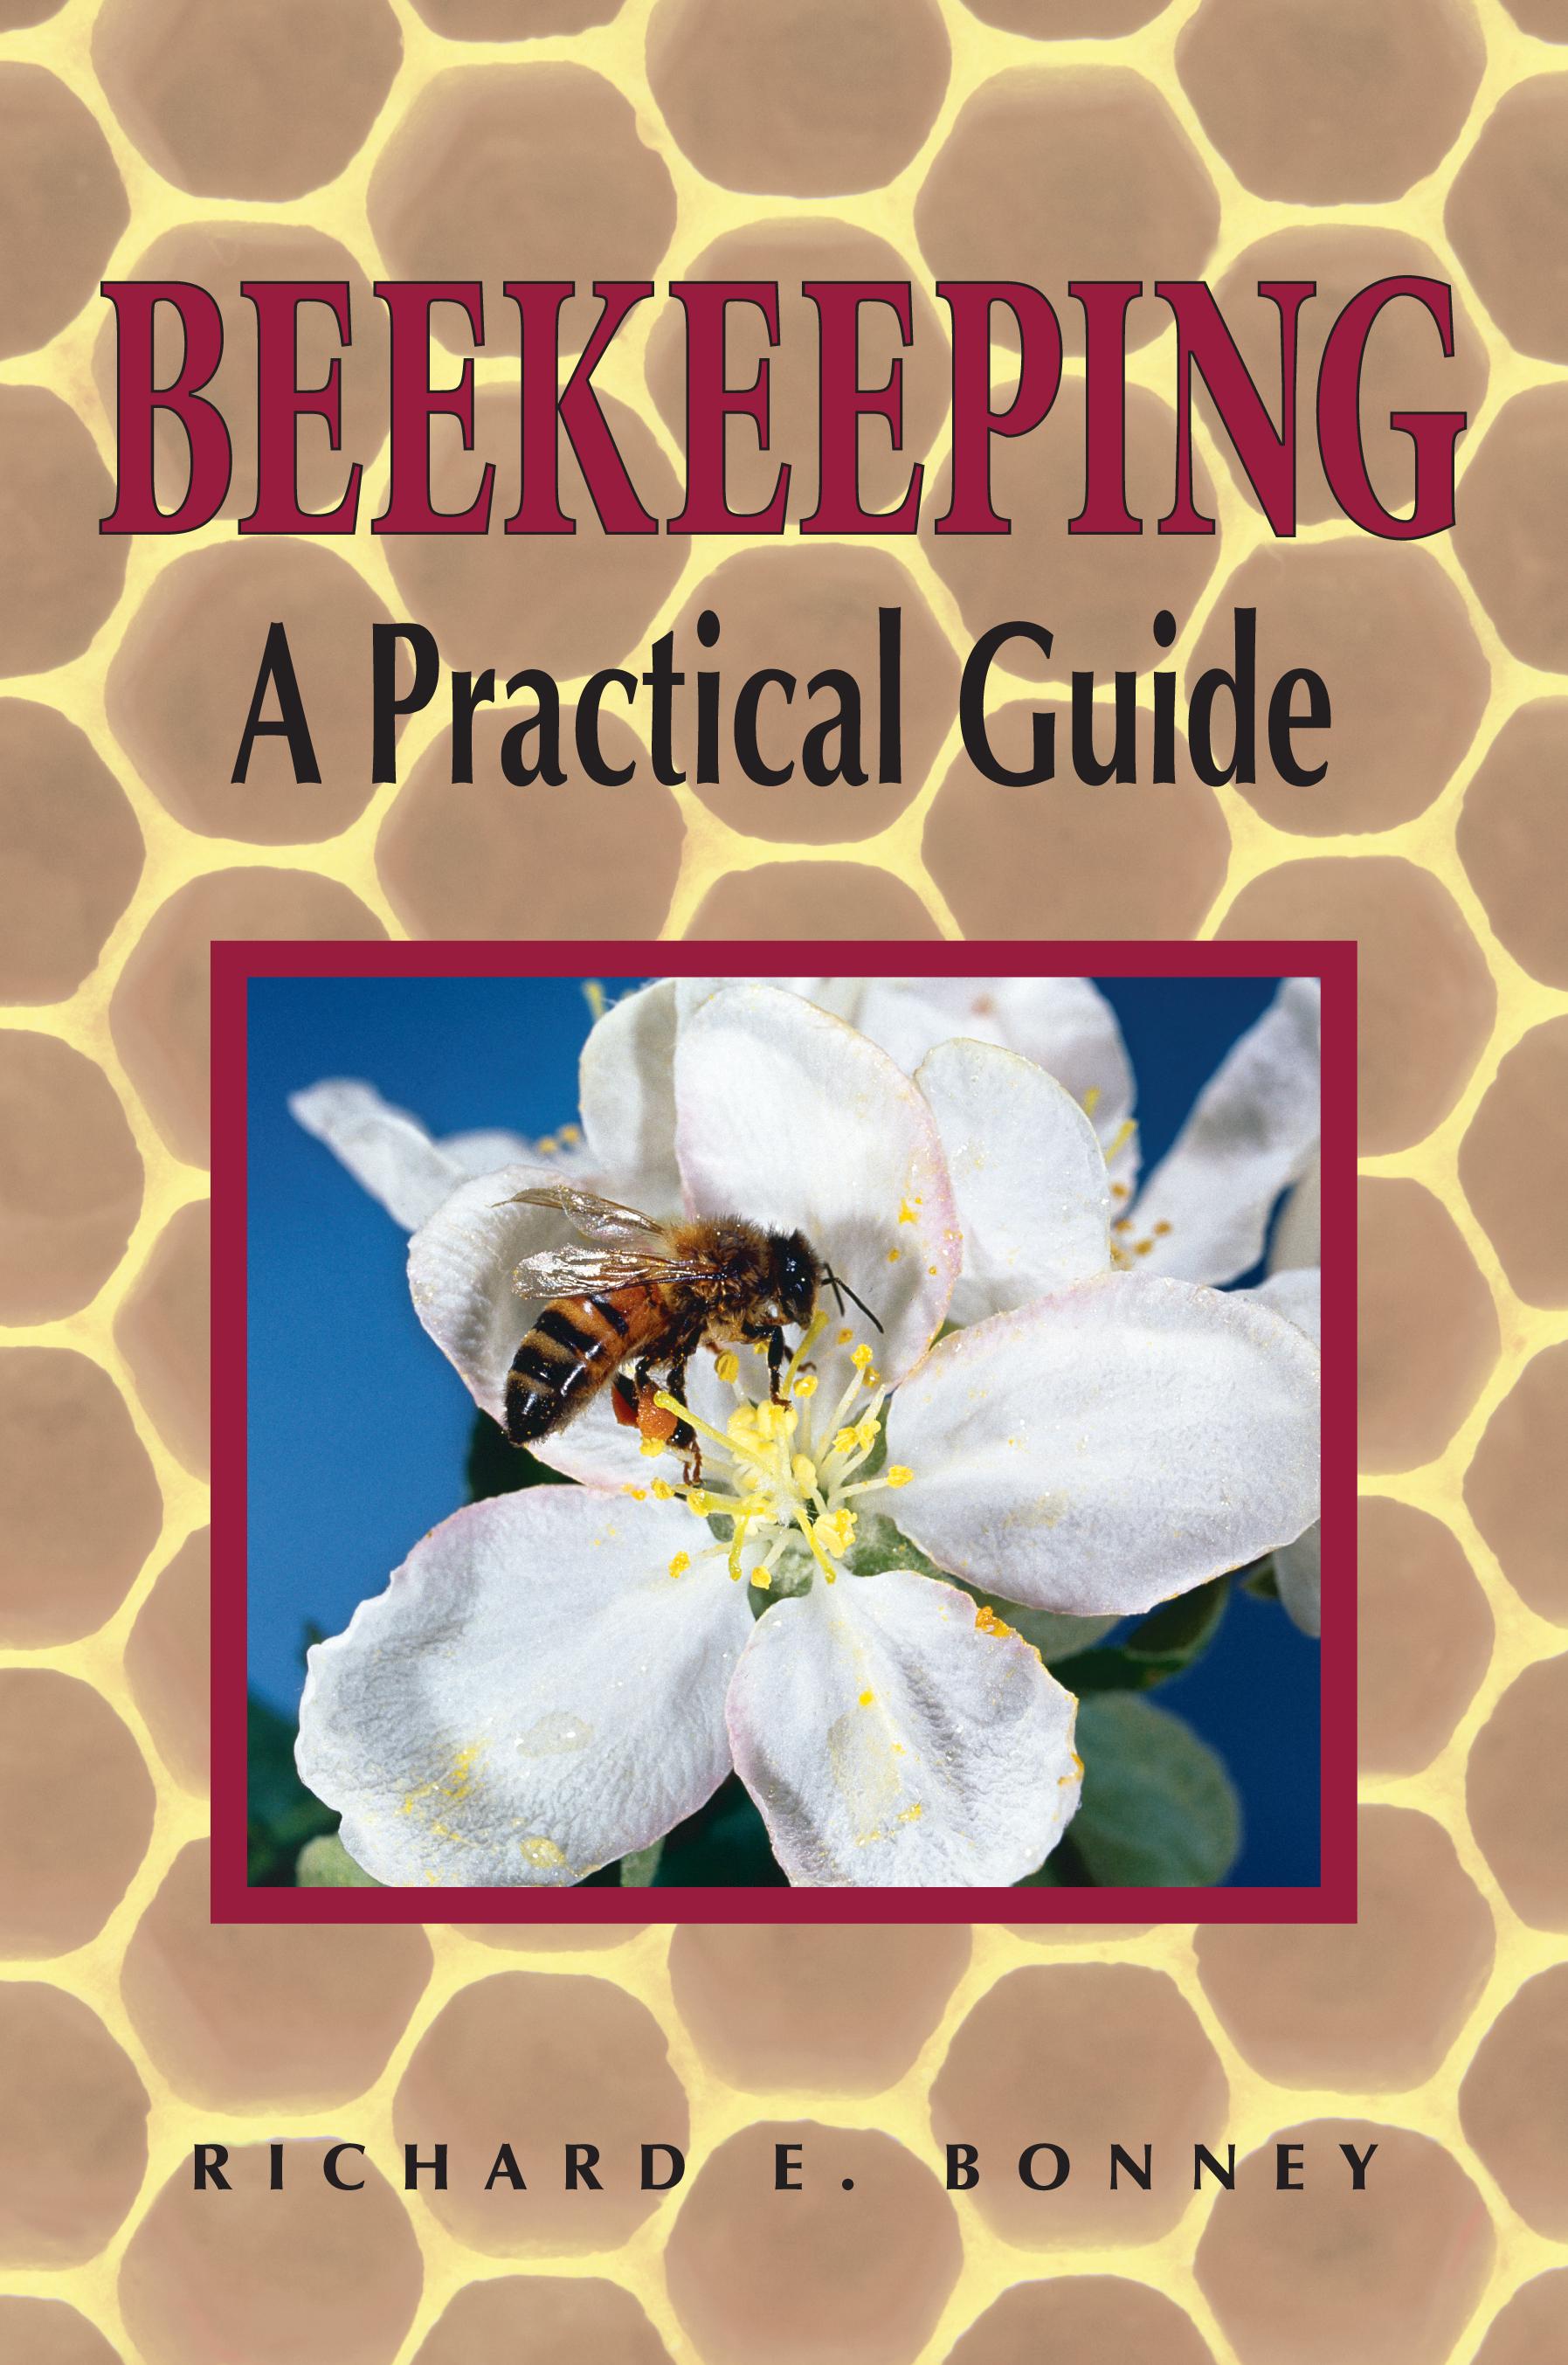 Beekeeping A Practical Guide - Richard E. Bonney